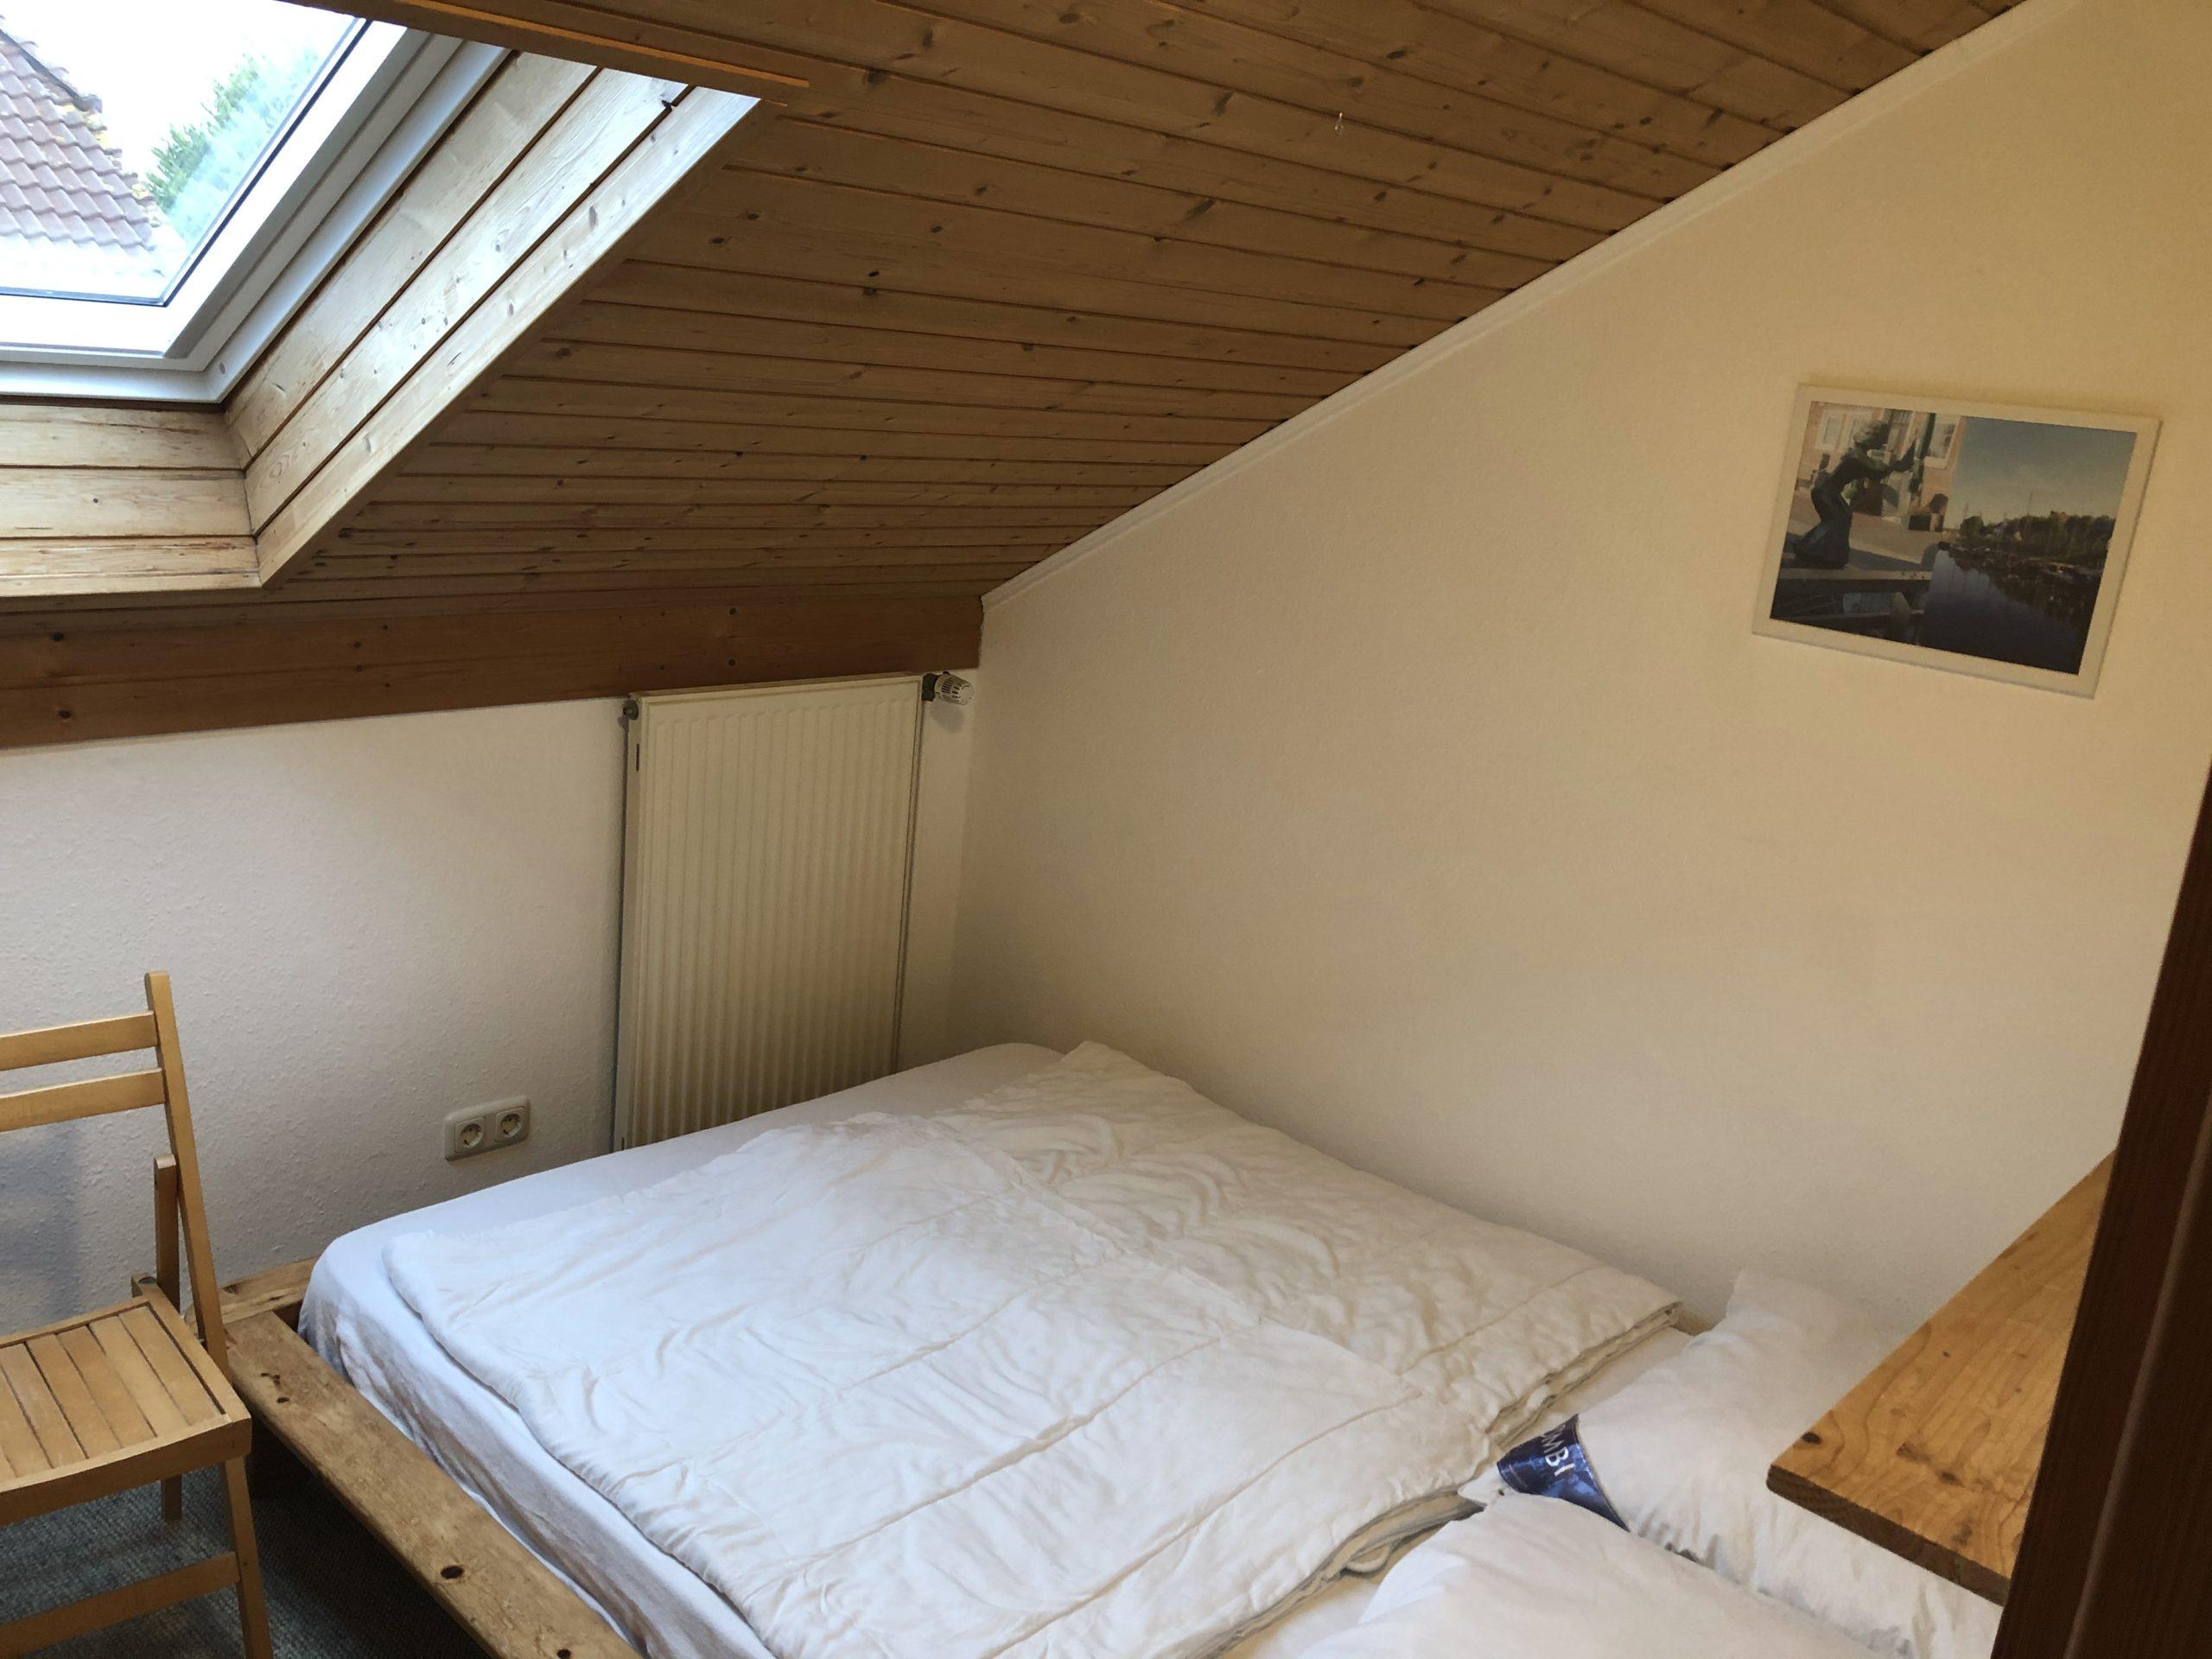 Ferienhaus Lippetal Schlafzimmer mit Kindergitterbett 1. OG